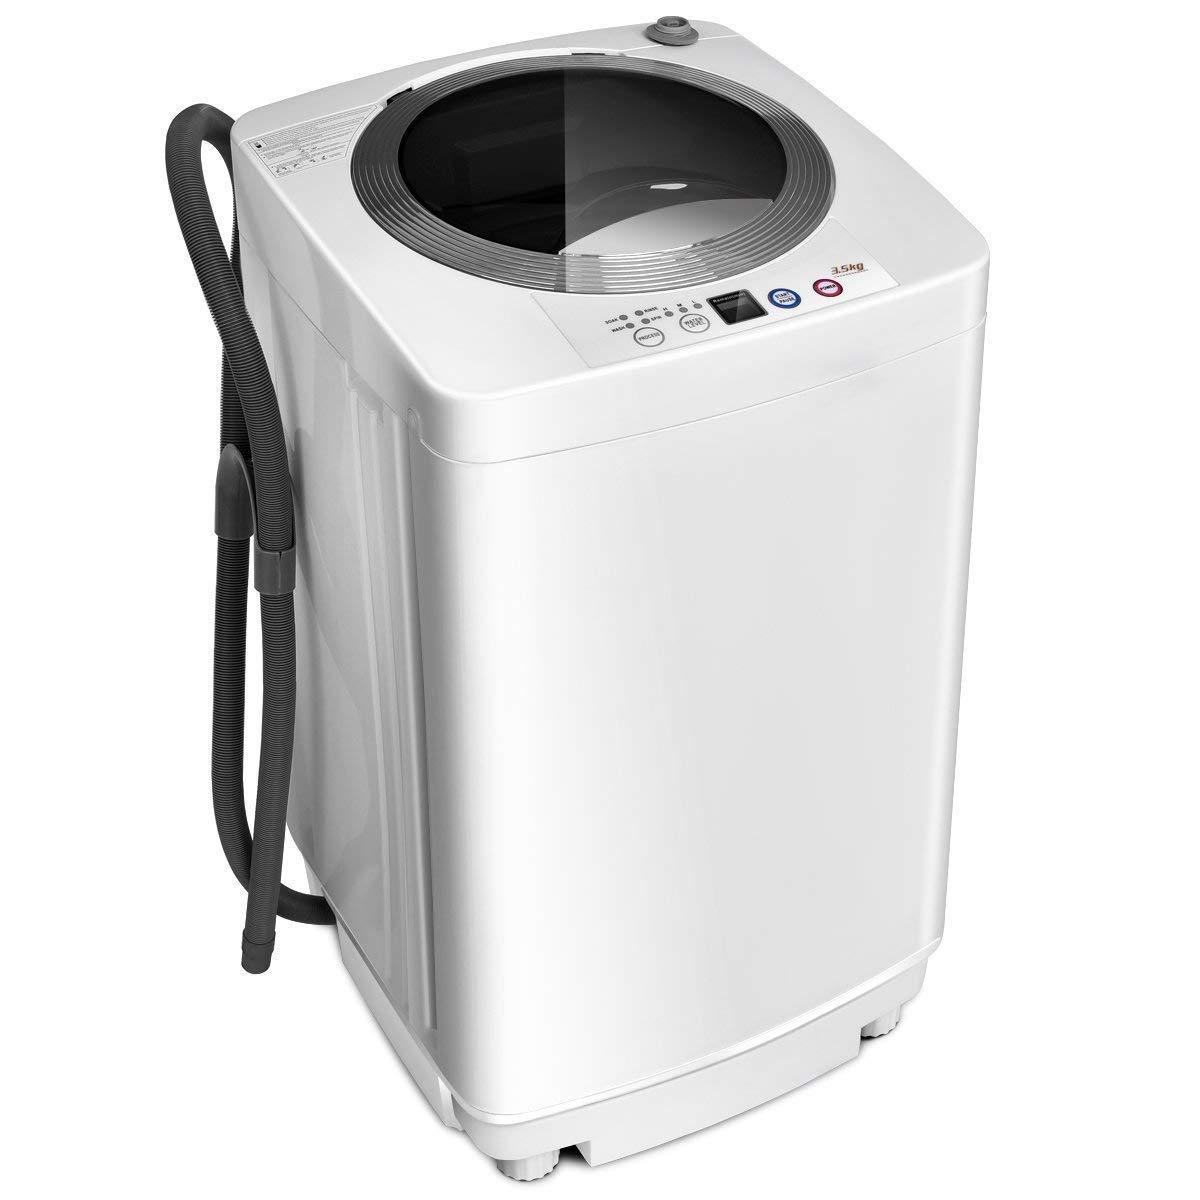 Giantex Portable Compact Full-Automatic Laundry 8 Lbs Load Capacity Washing Machine